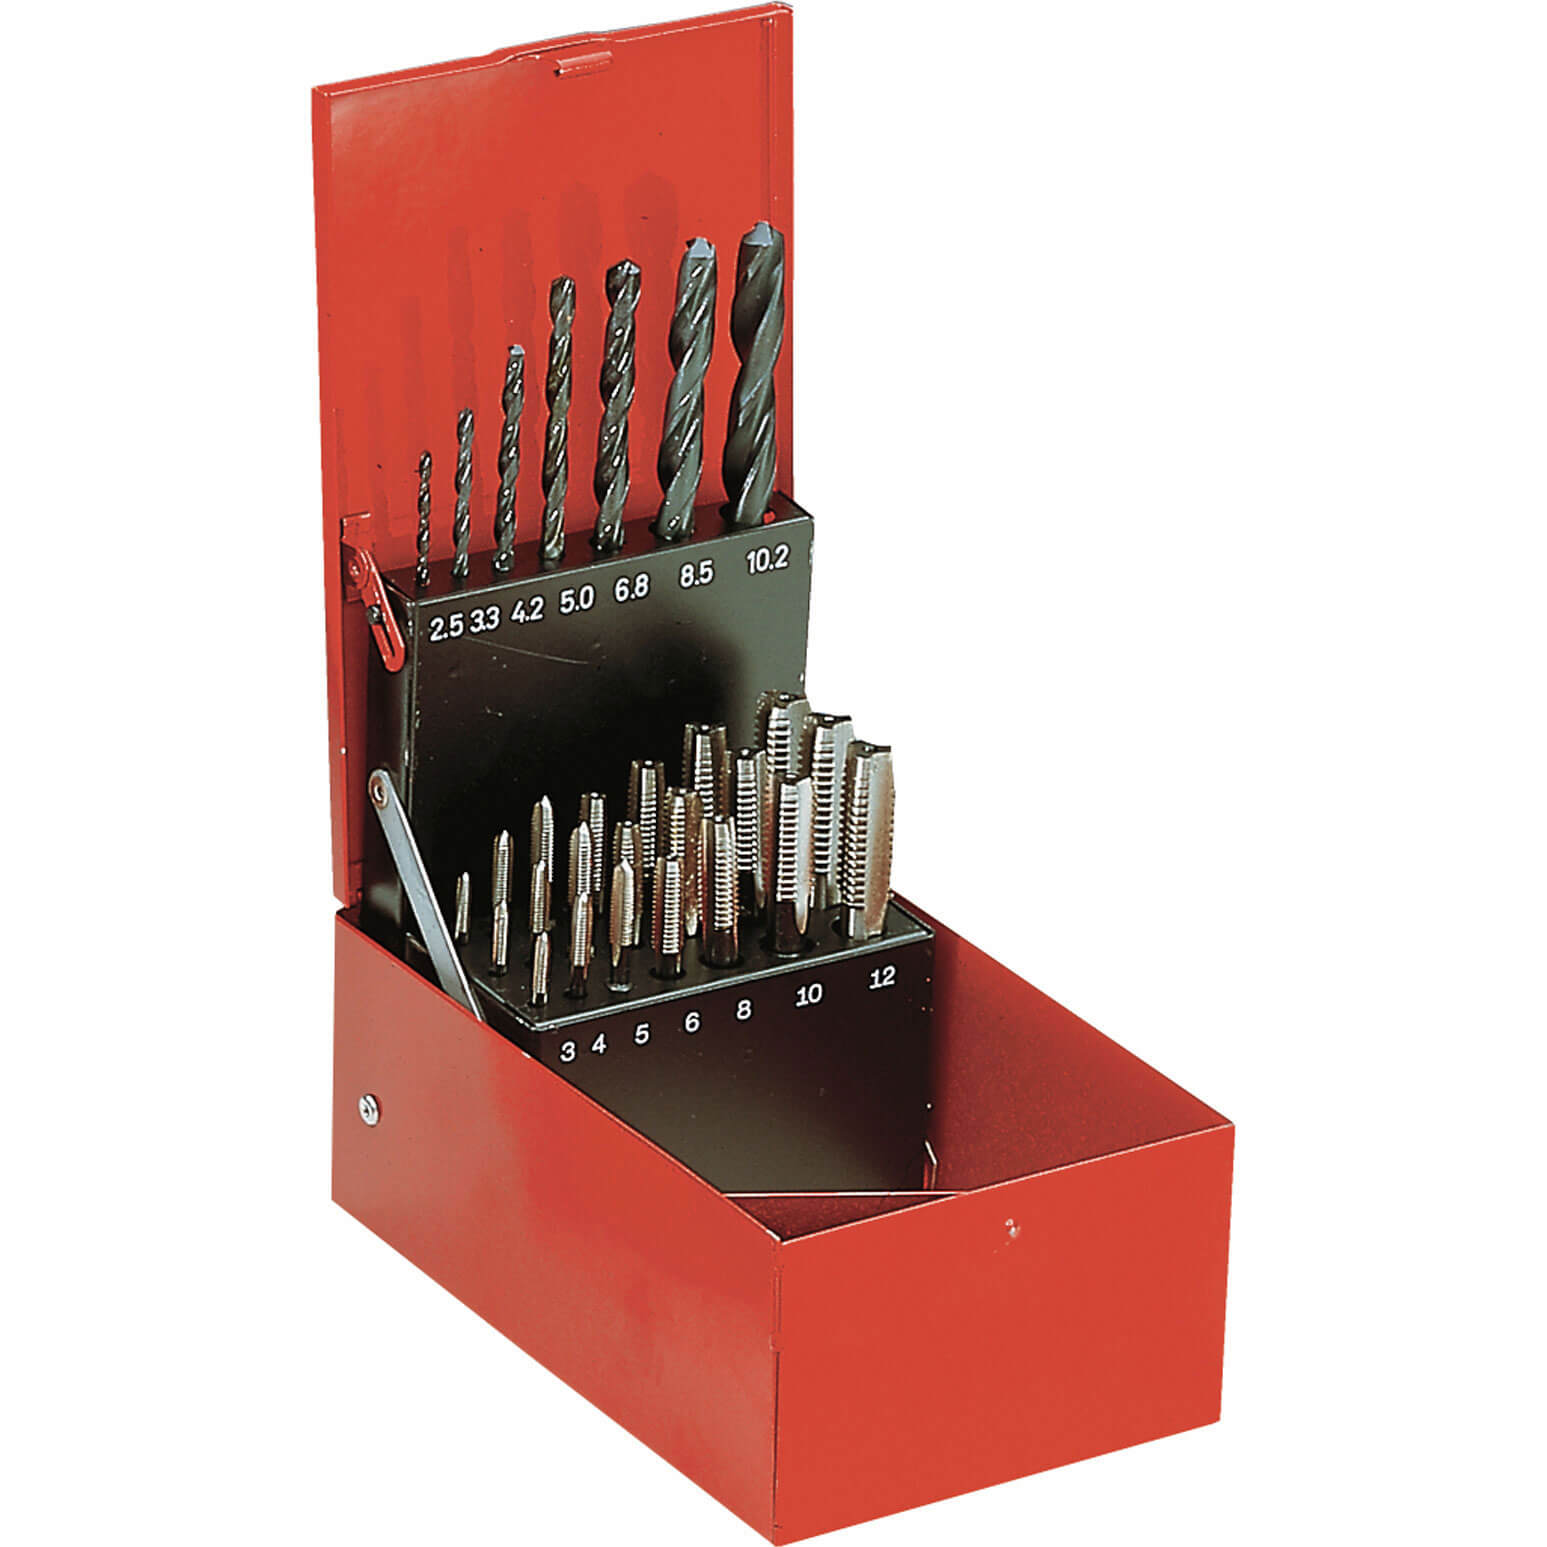 Facom 28 Piece HSS Tap and Drill Bit Set Metric